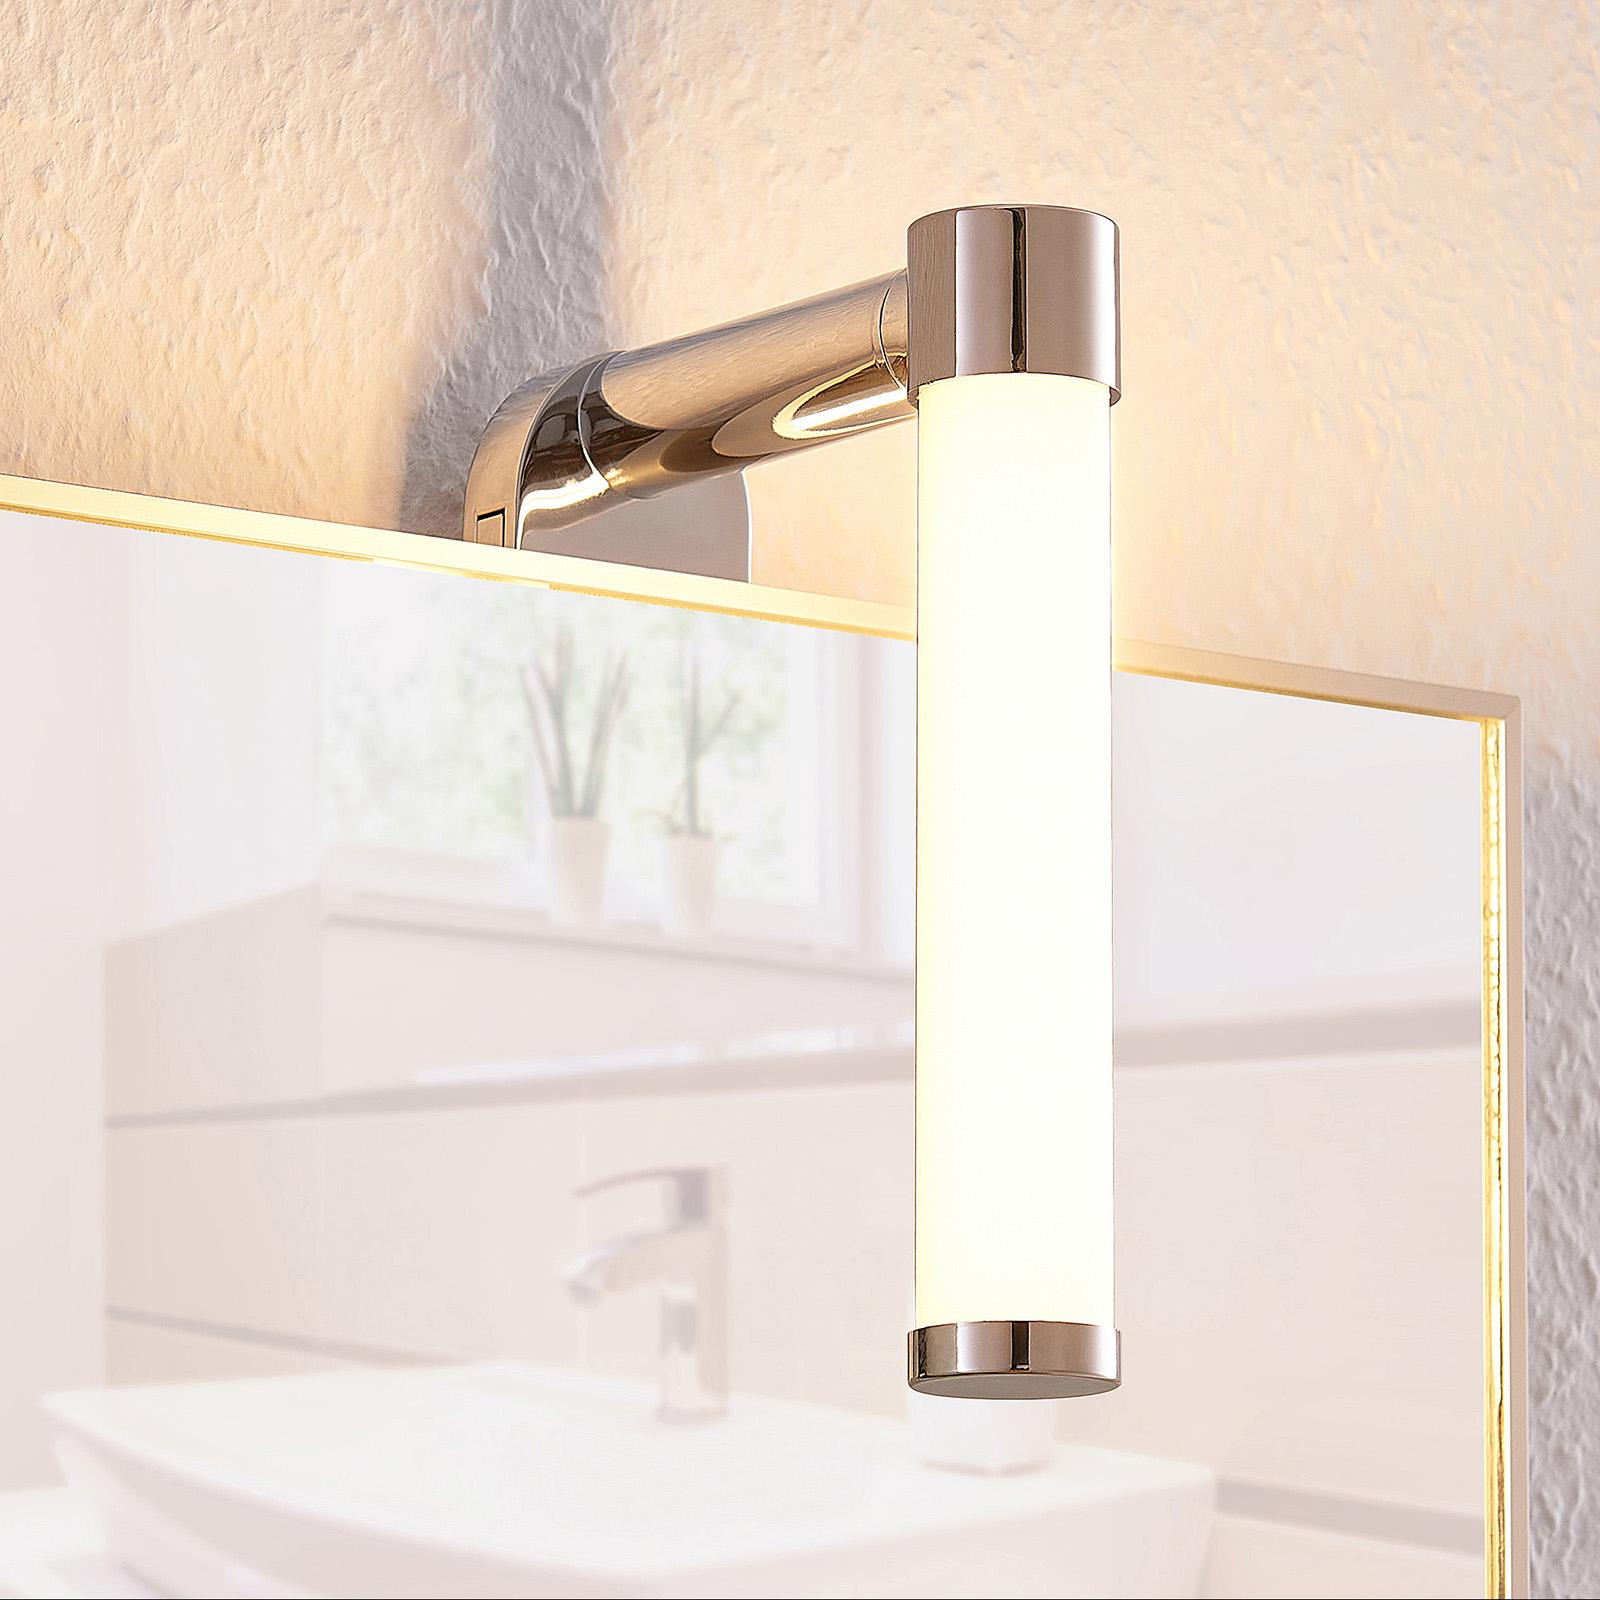 Lindby Hafren LED-Spiegelleuchte, 15 cm